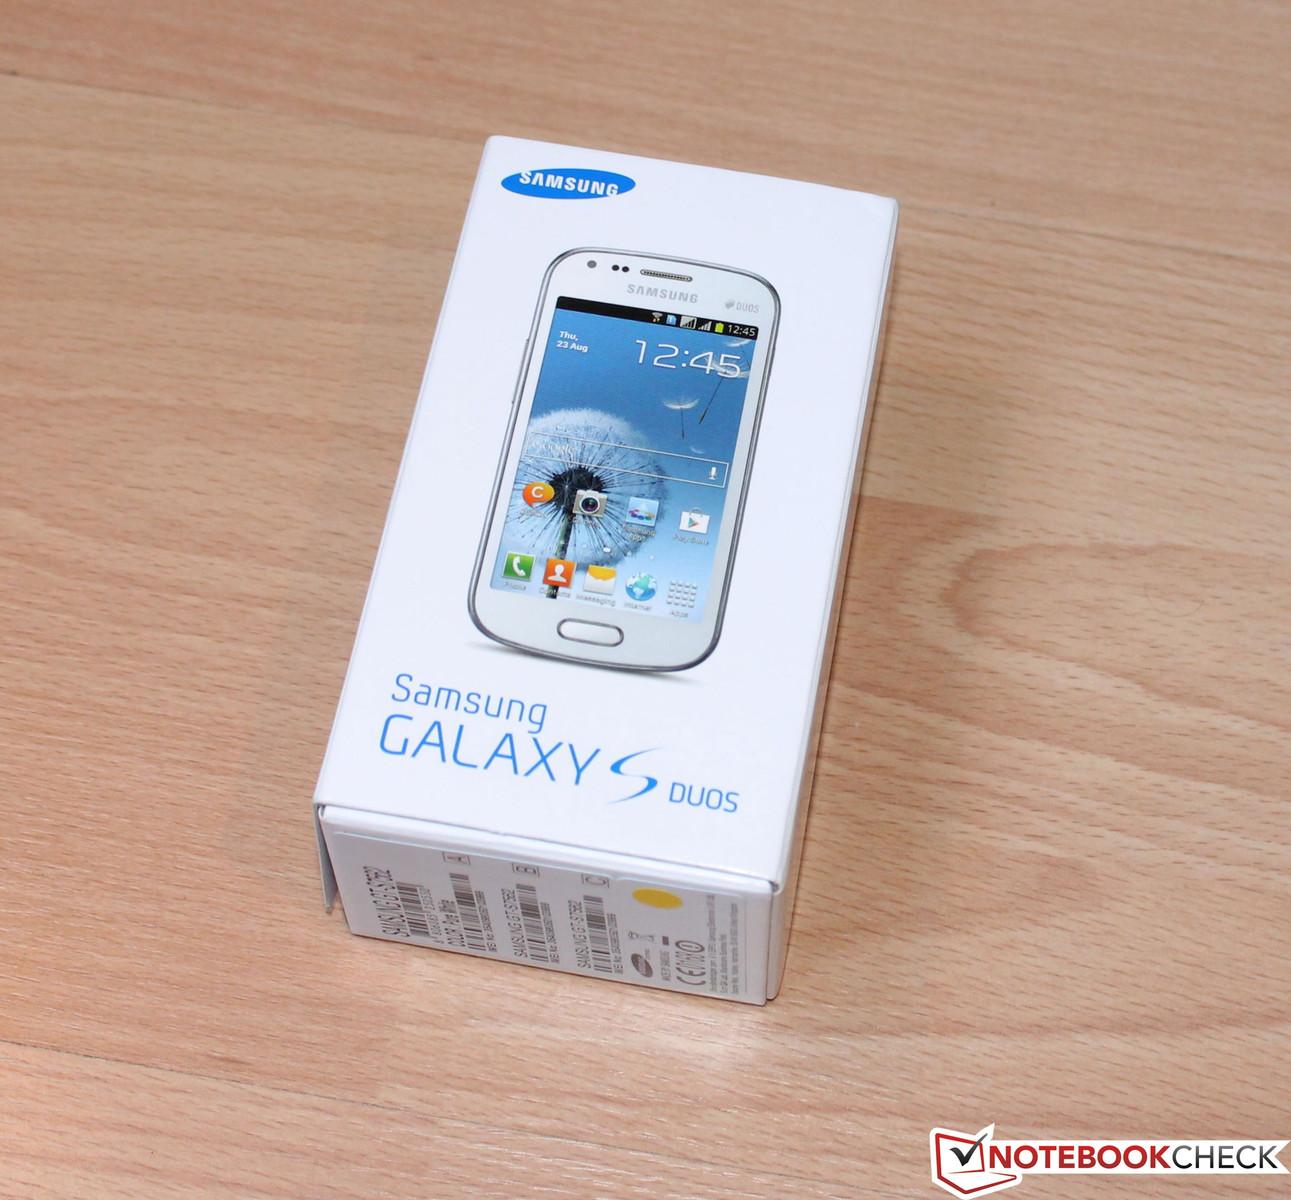 Samsung Galaxy S3 Mini Sim Karte.Review Samsung Galaxy S Duos Gt S7562 Smartphone Notebookcheck Net